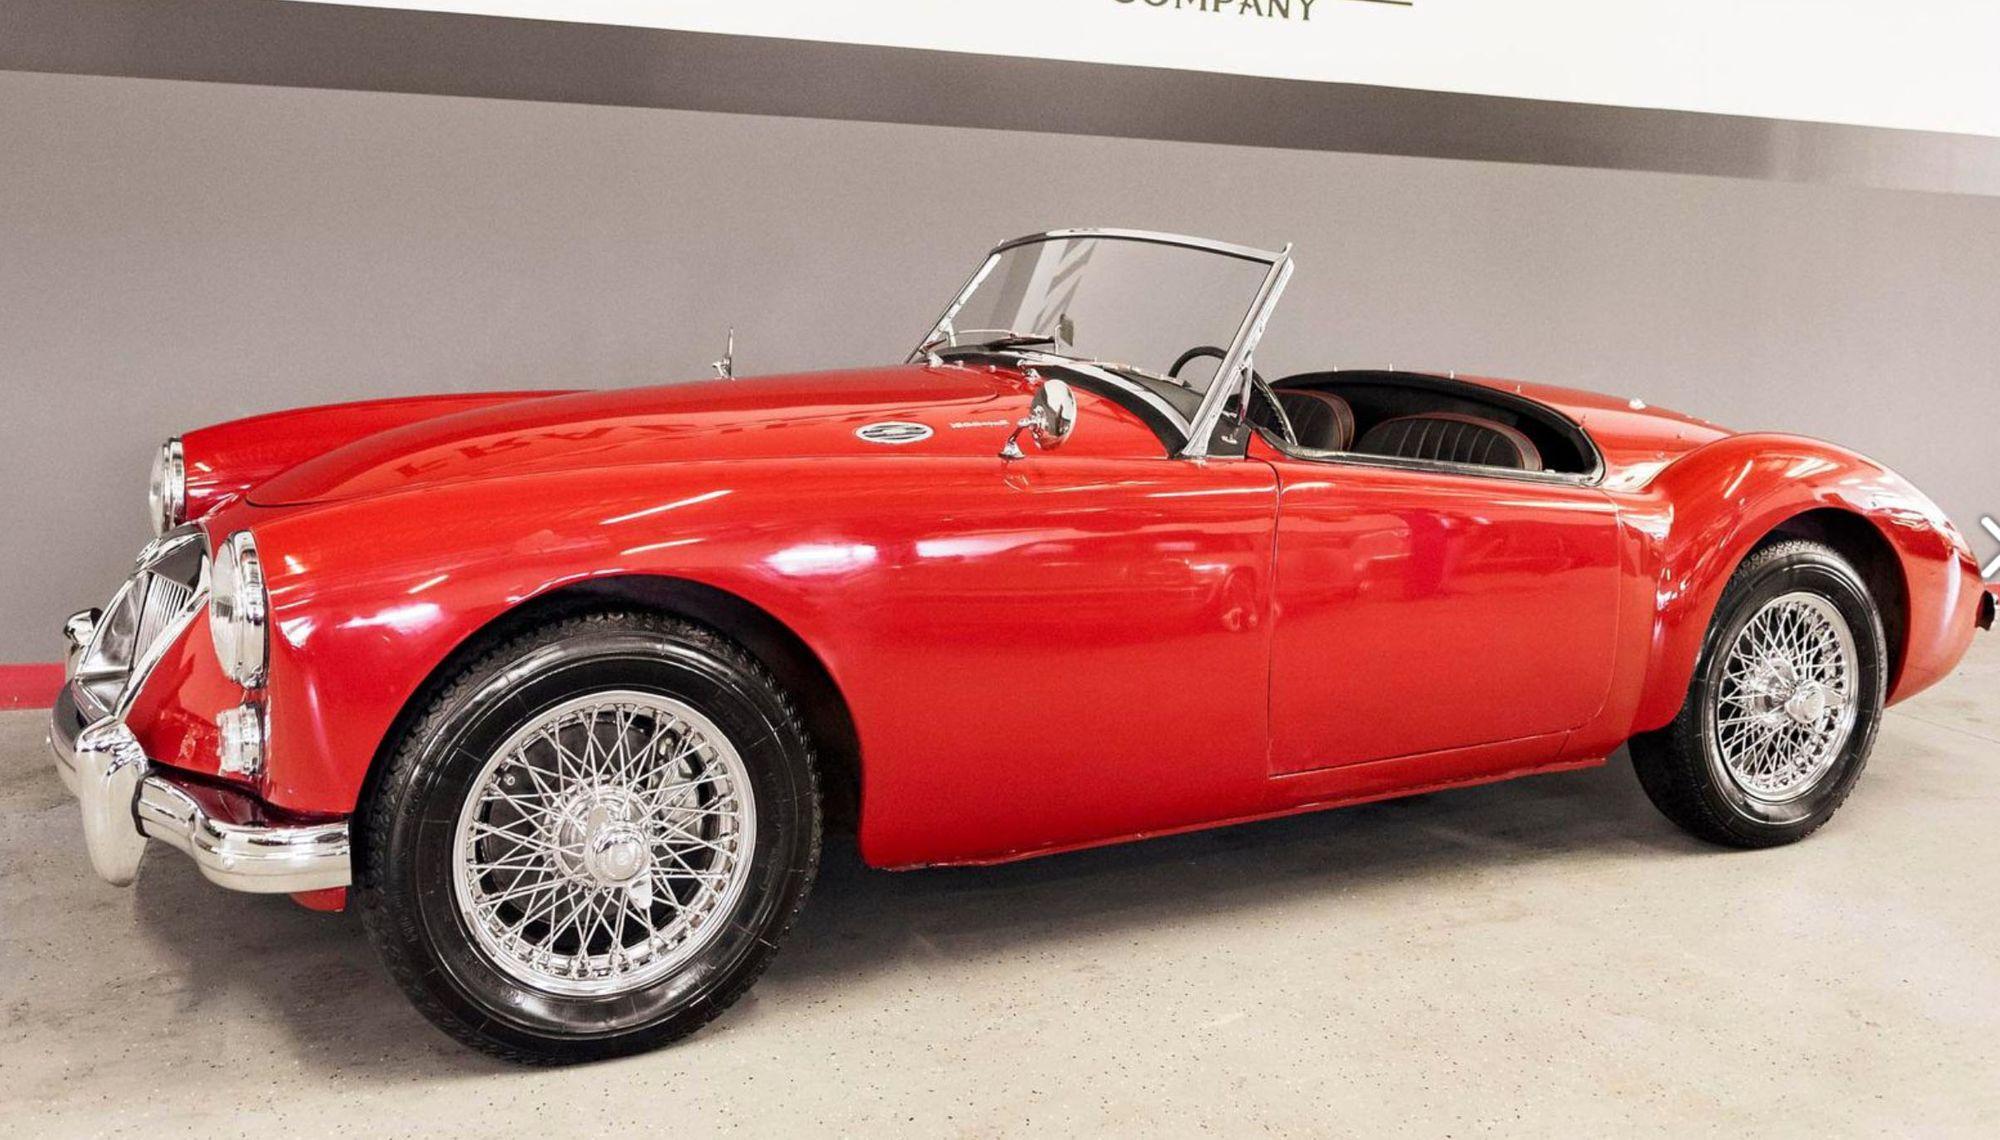 "<img src=""1962-mg-mga-roadster.jpg"" alt=""A beautiful example of a 1962 MG MGA MKII Roadster"">"